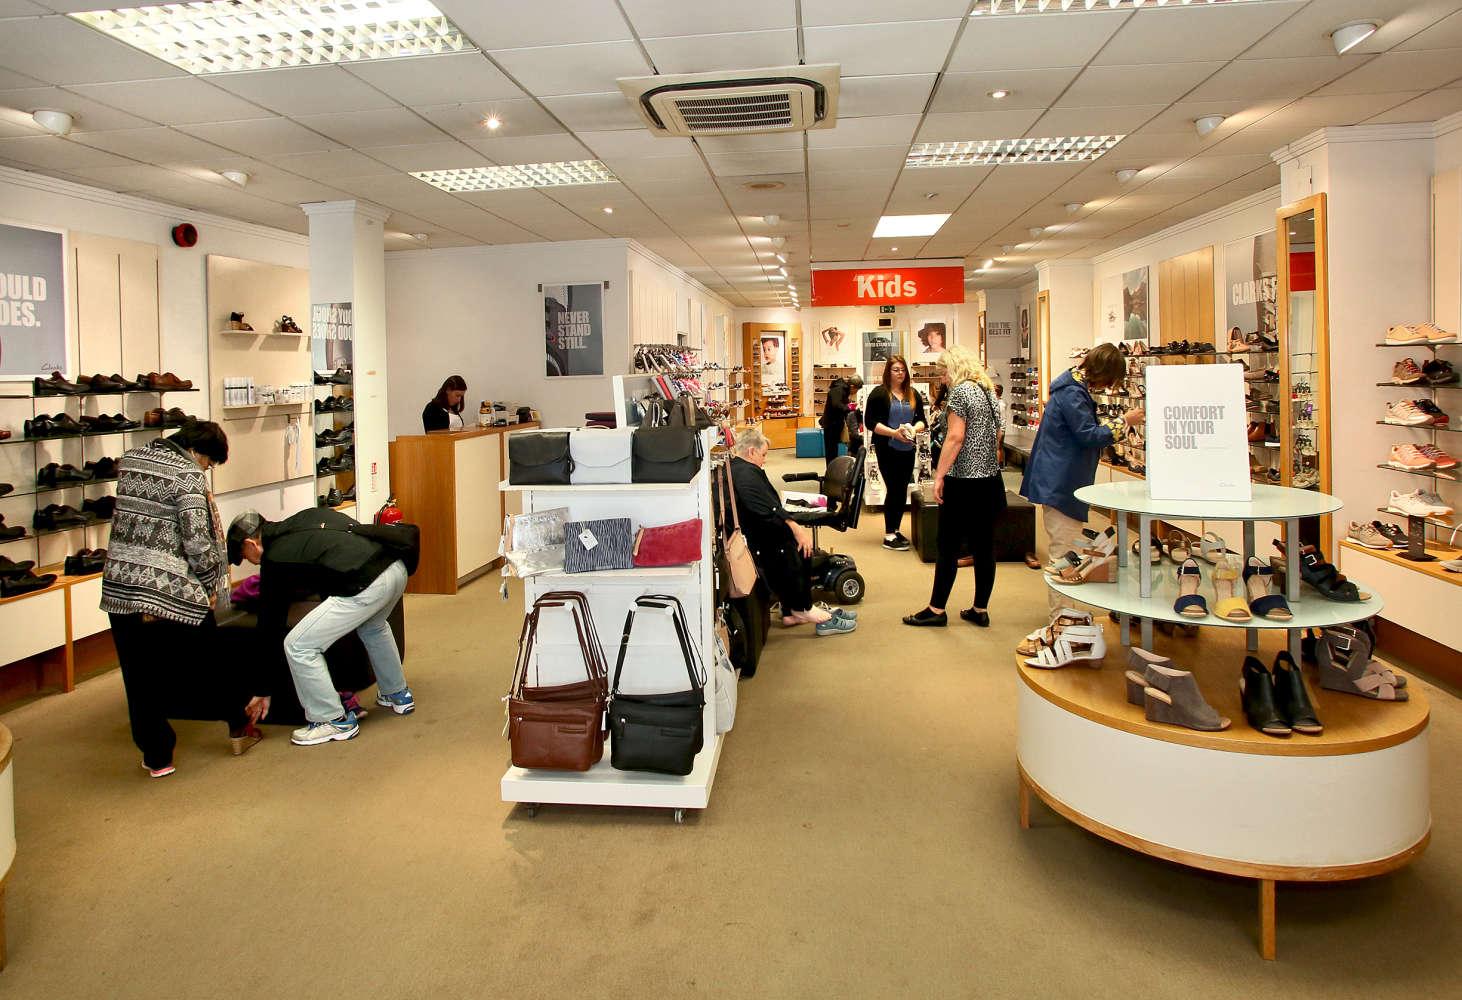 Retail high street Inverness, IV1 1JE - 40-42, High Street - 0071